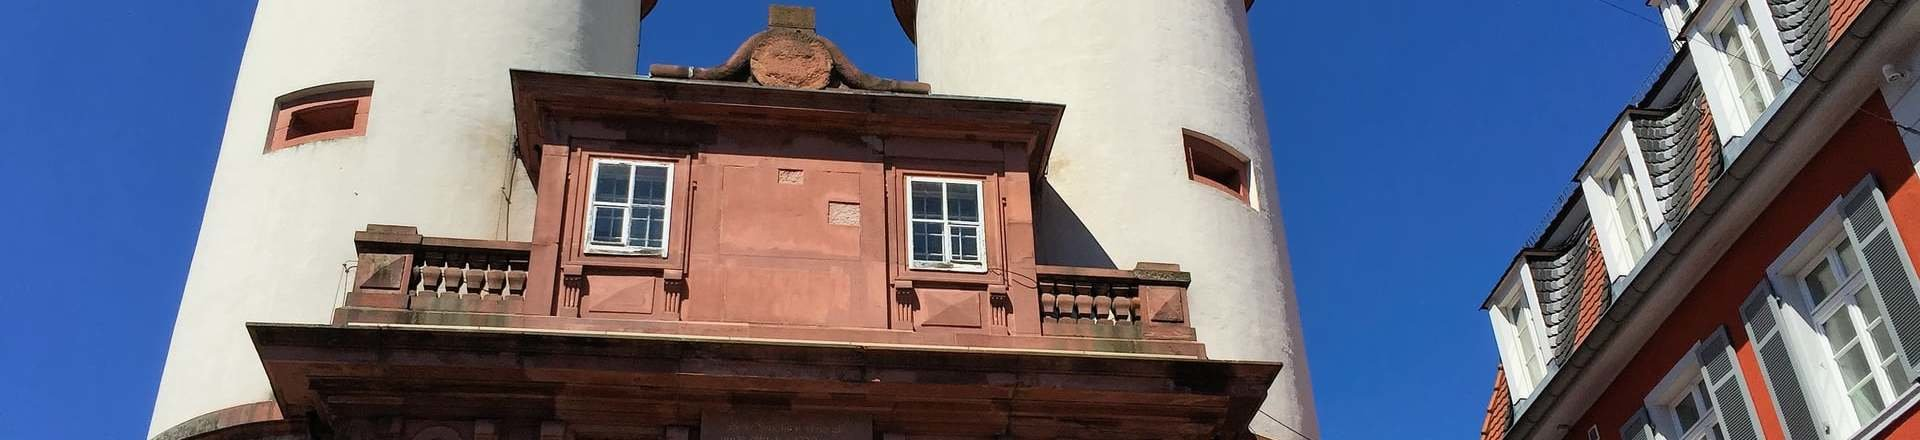 Hotel Heidelberg Gunstig